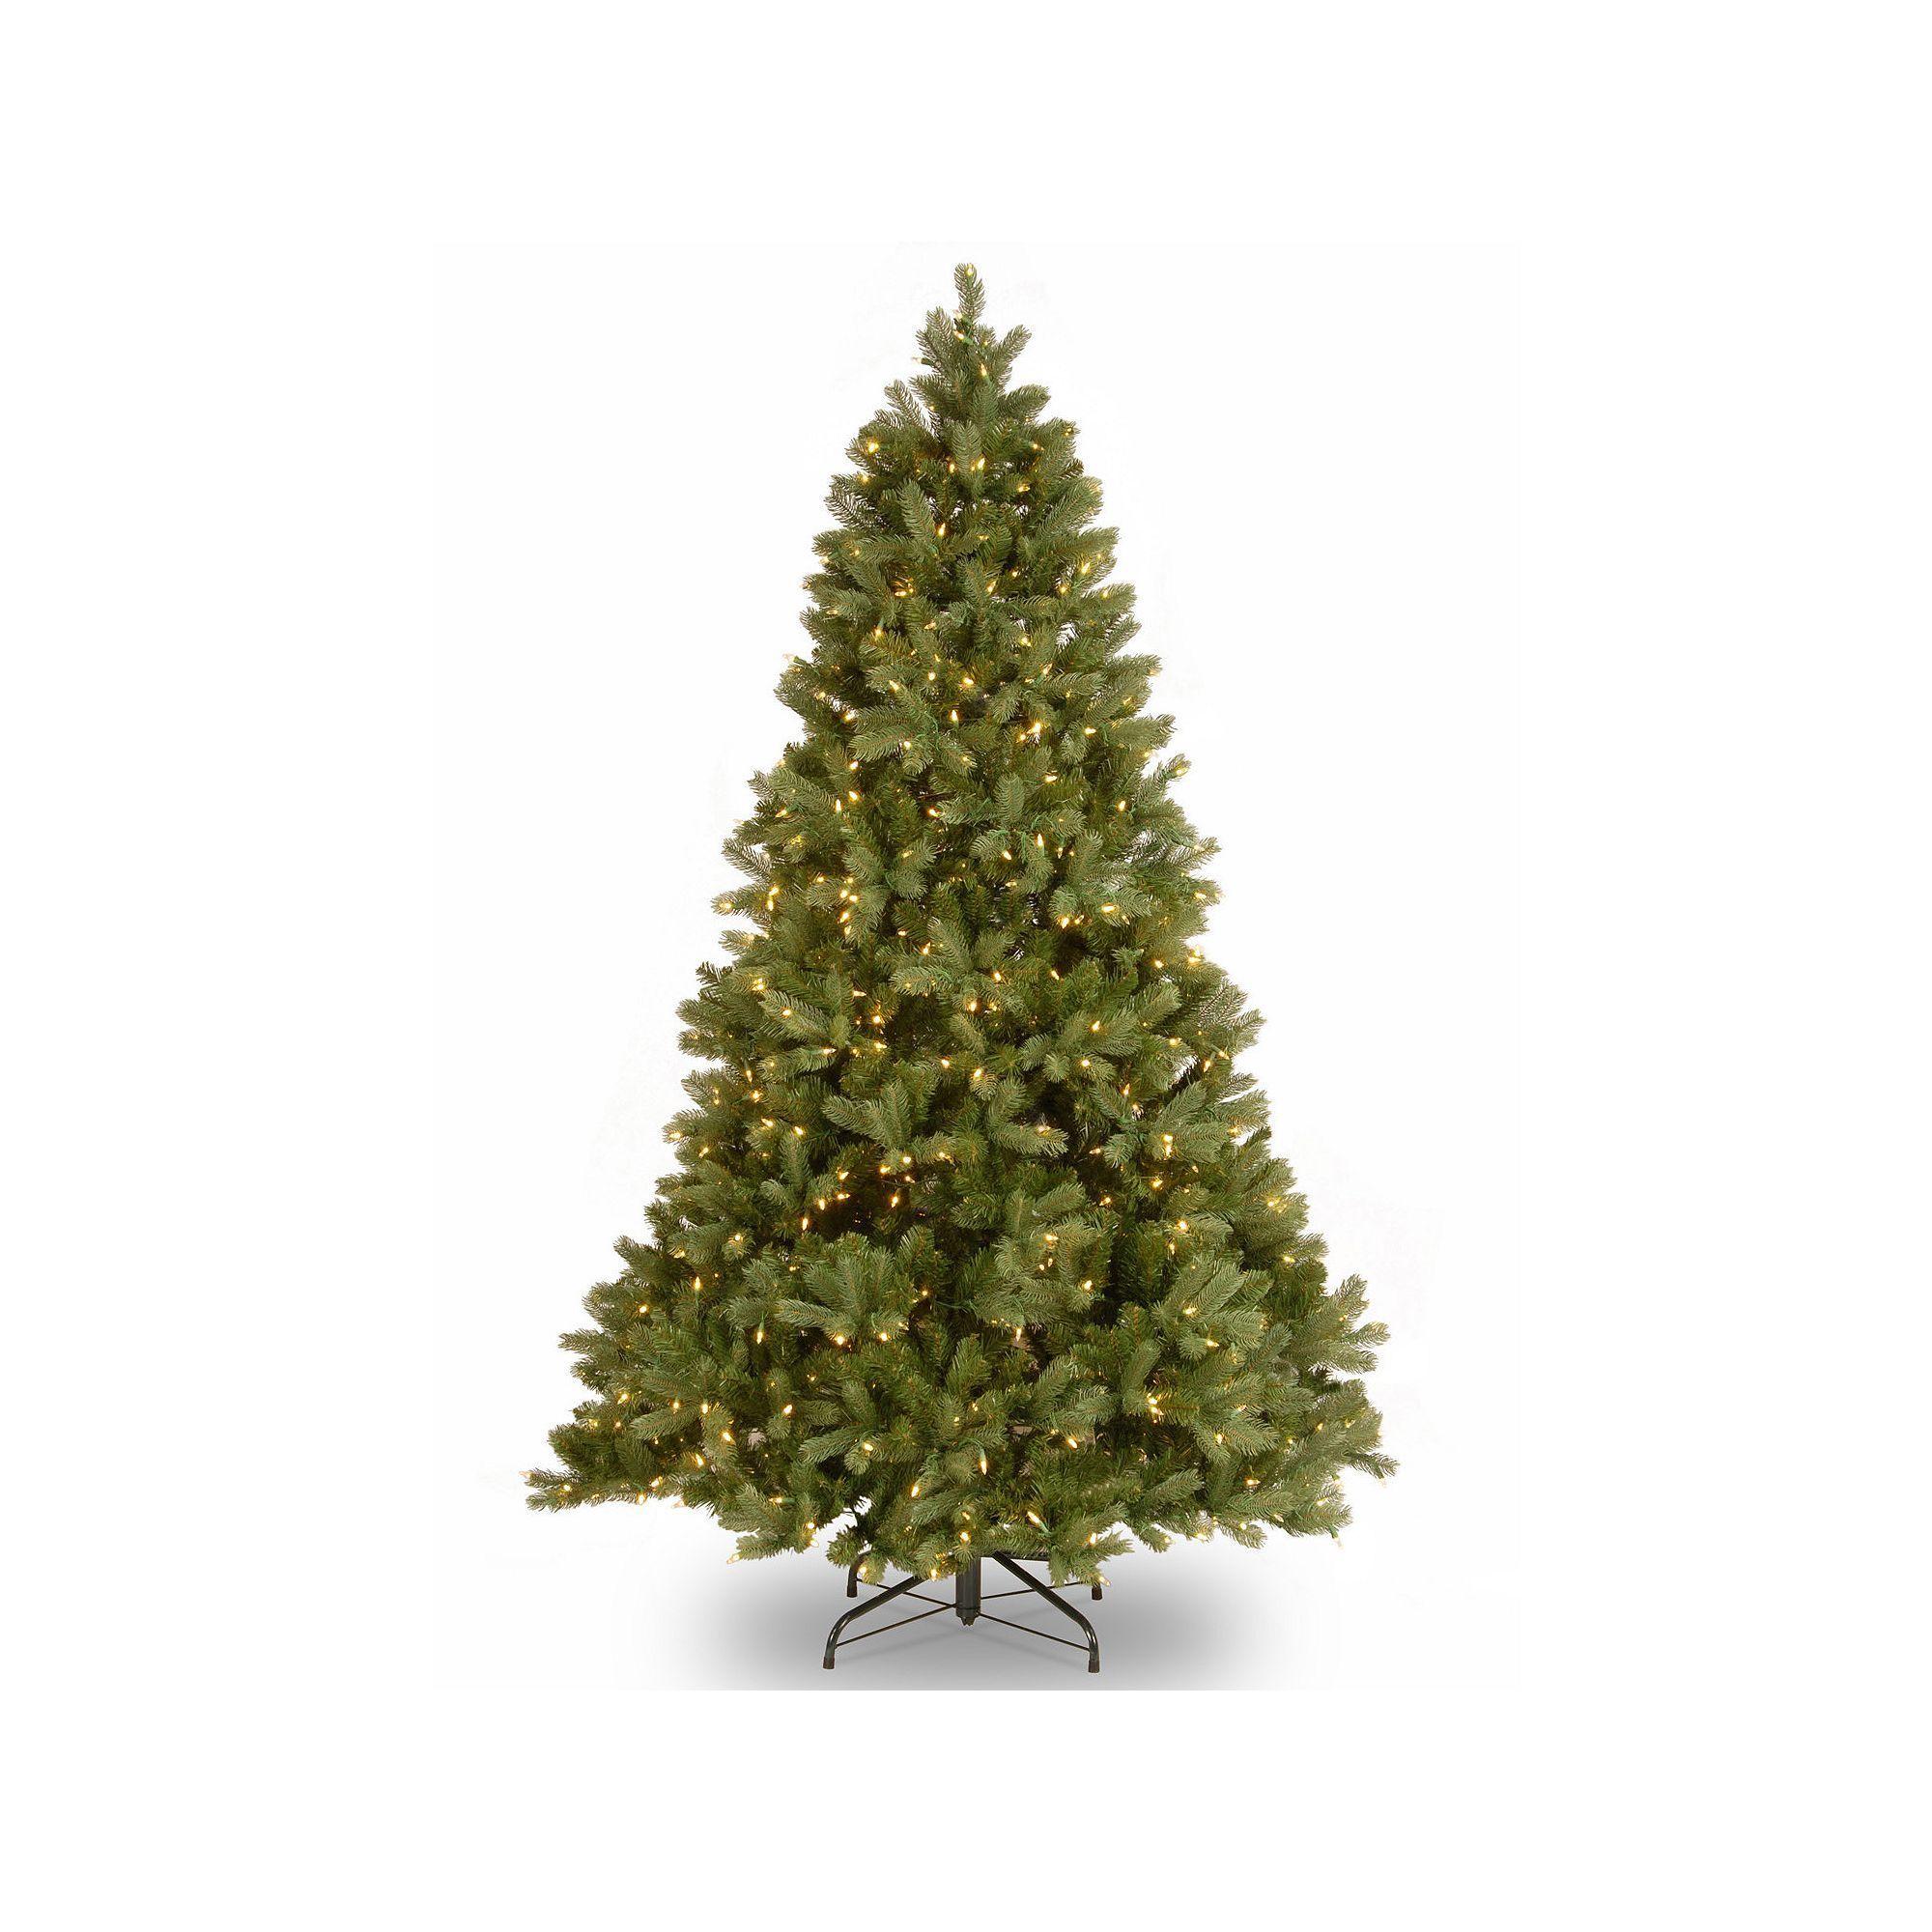 9d8082c33ee0f National Tree Company 7.5-ft. Douglas Fir Hinged Pre-Lit Artificial  Christmas Tree